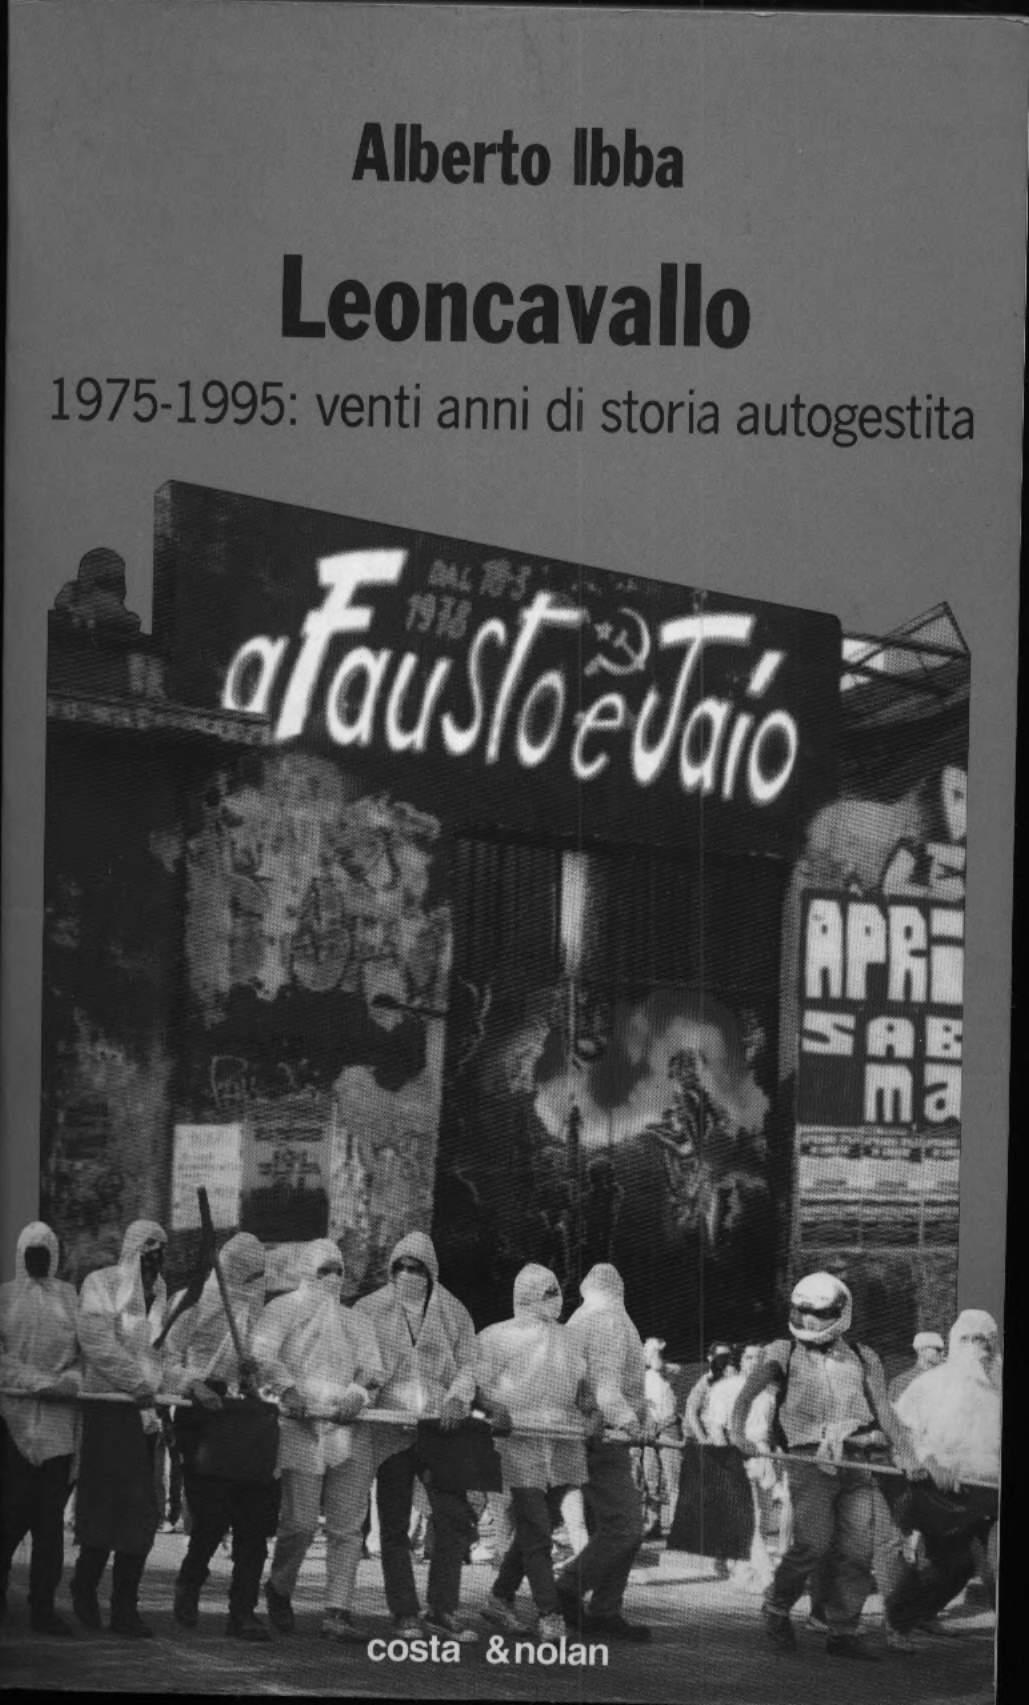 Leoncavallo: 1975-1995